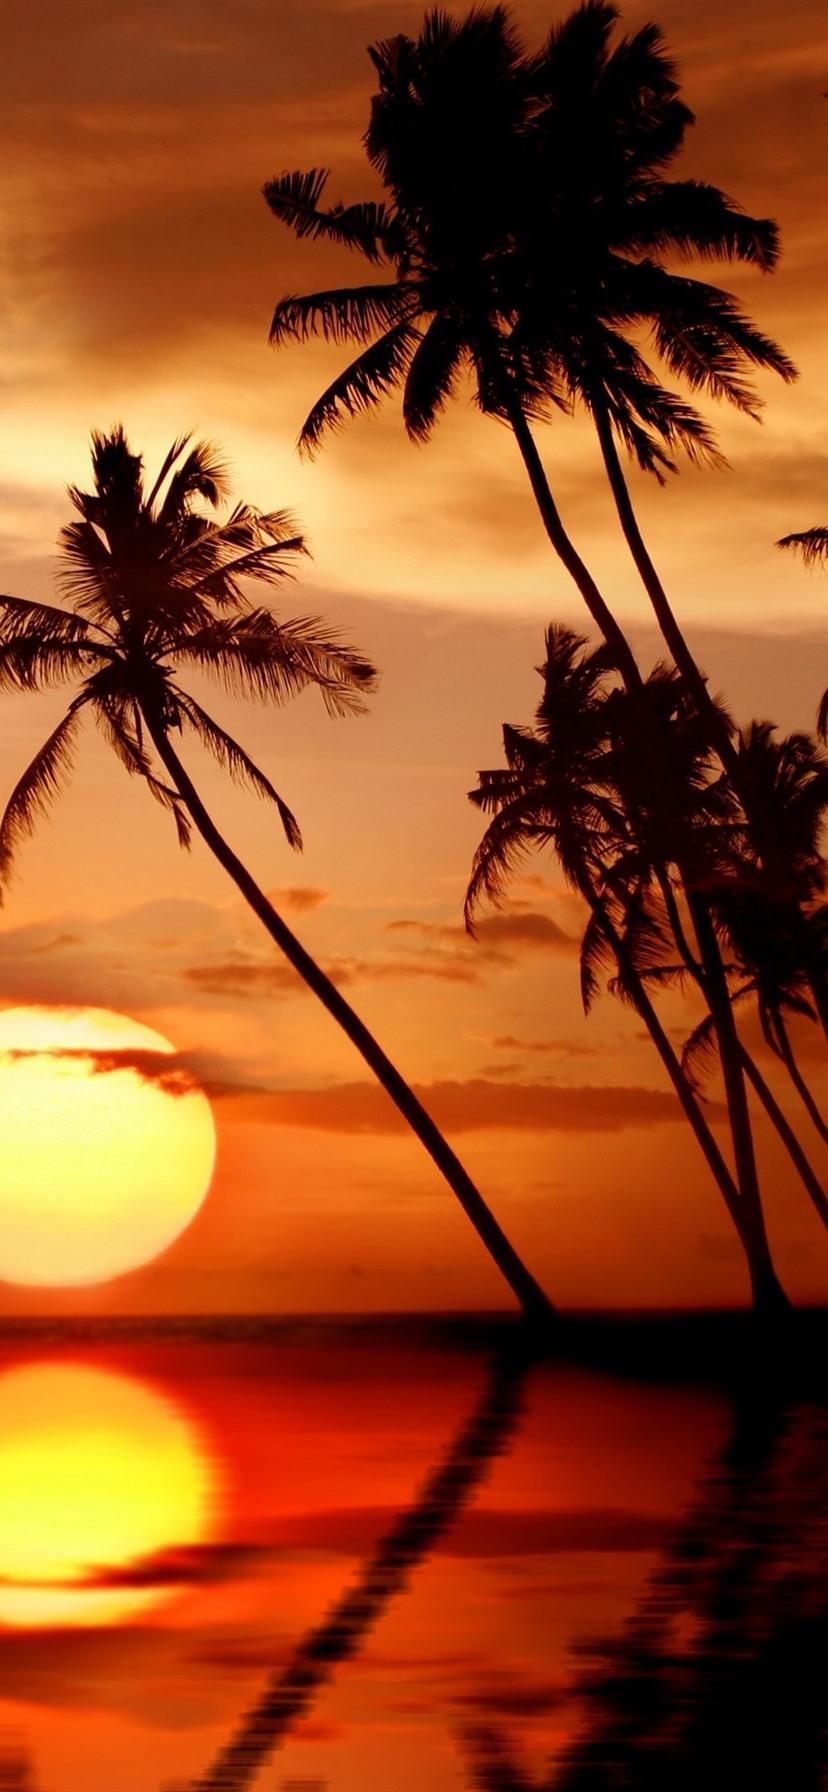 Wallpaper Beautiful Tropical Sunset Palm Trees Sea Beach